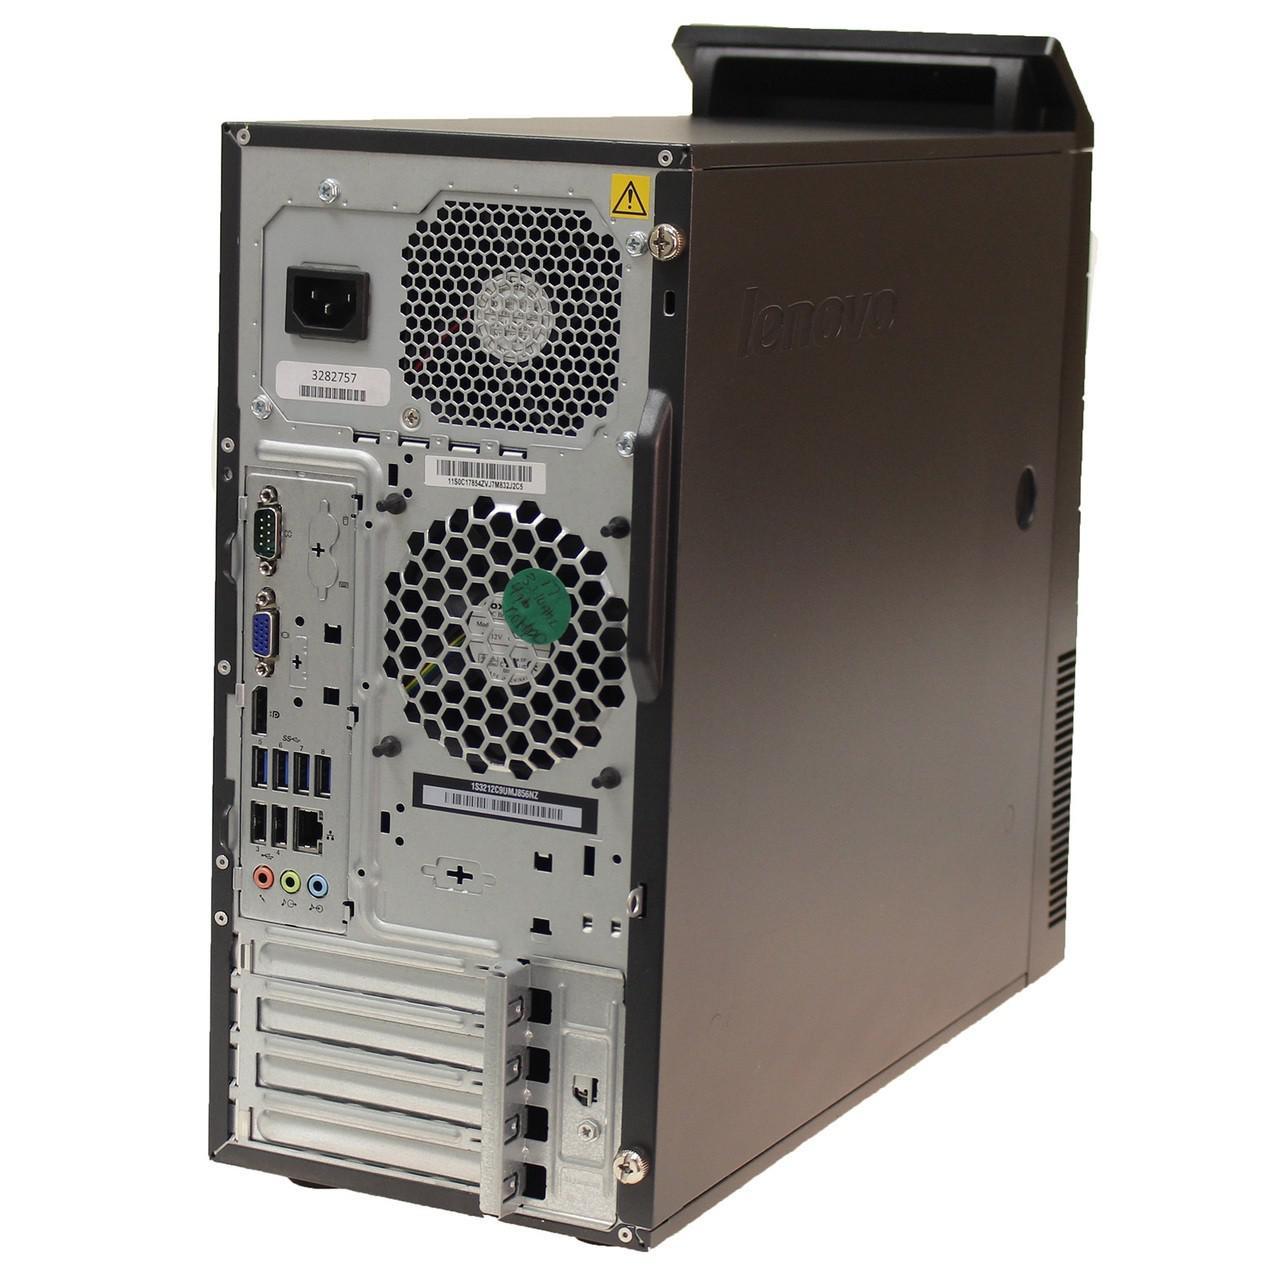 Lenovo ThinkCentre M92p Intel Core i5 3,2 GHz - HDD 500 Go RAM 8 Go